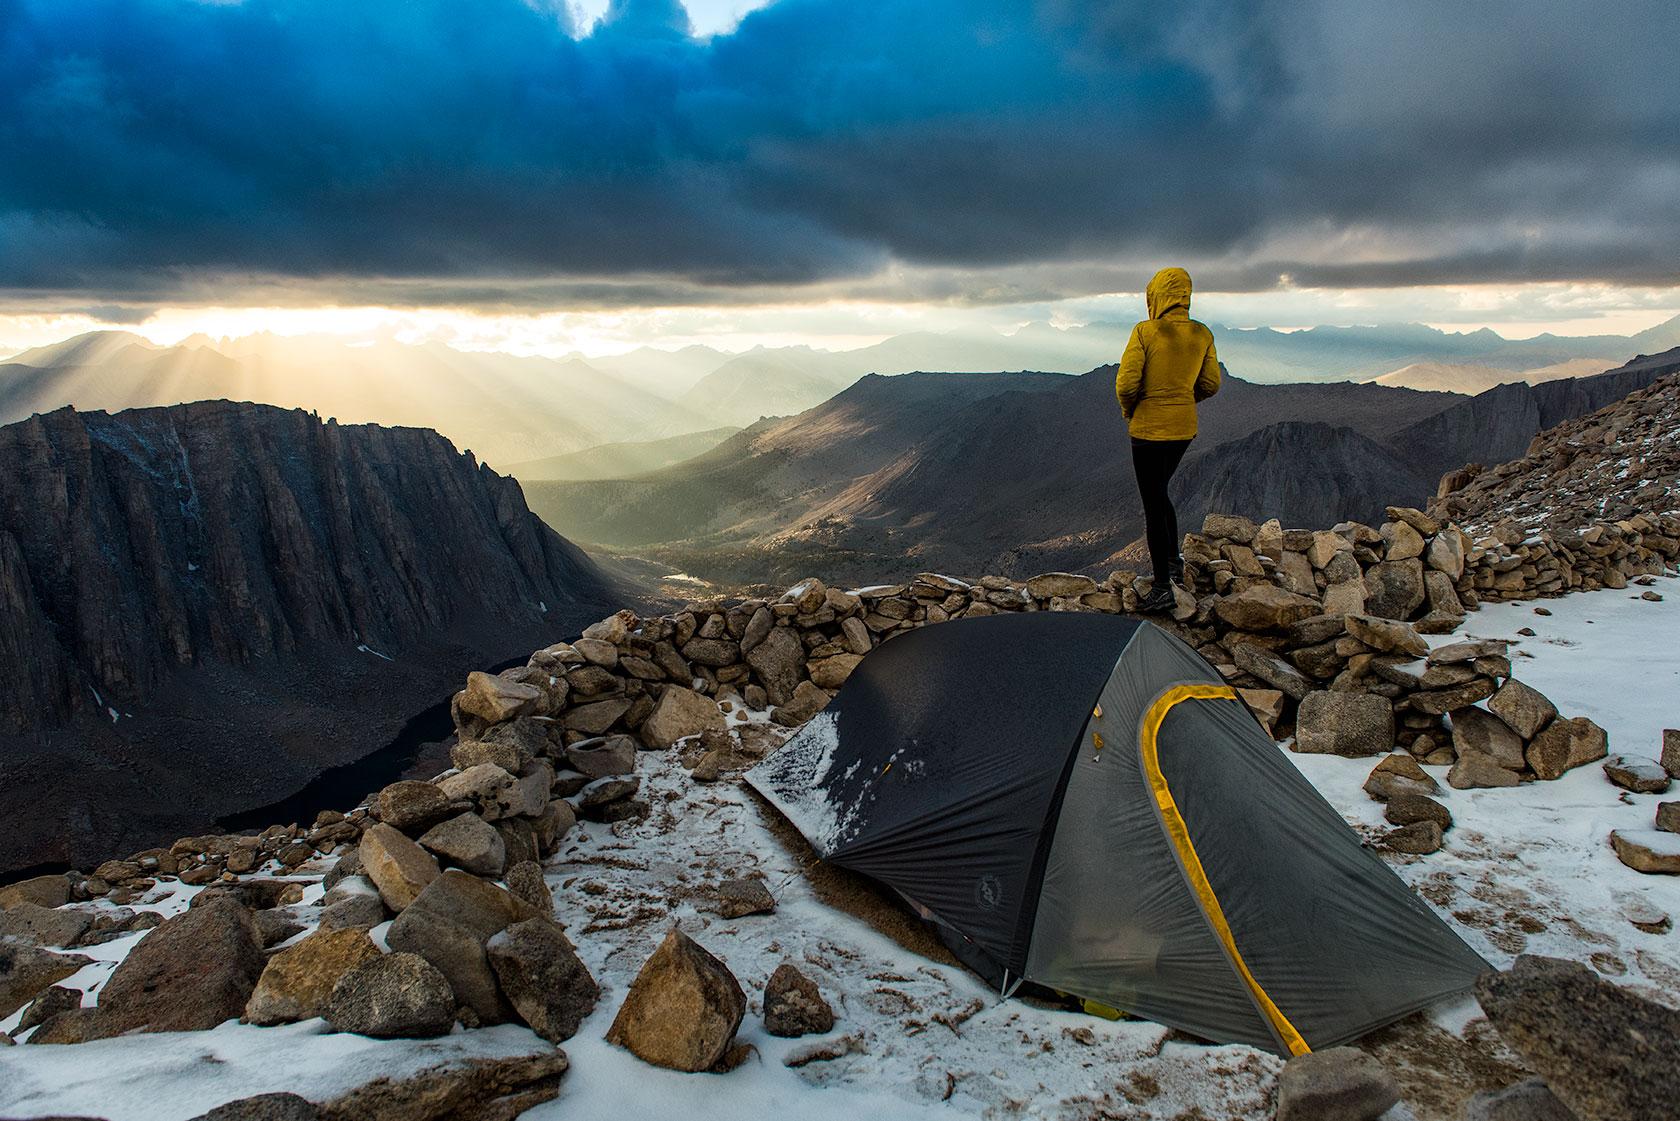 austin-trigg-big-agnes-tent-john-muir-trail-camping-FlyCreek2-Trail-Crest-Bivy-snow.jpg